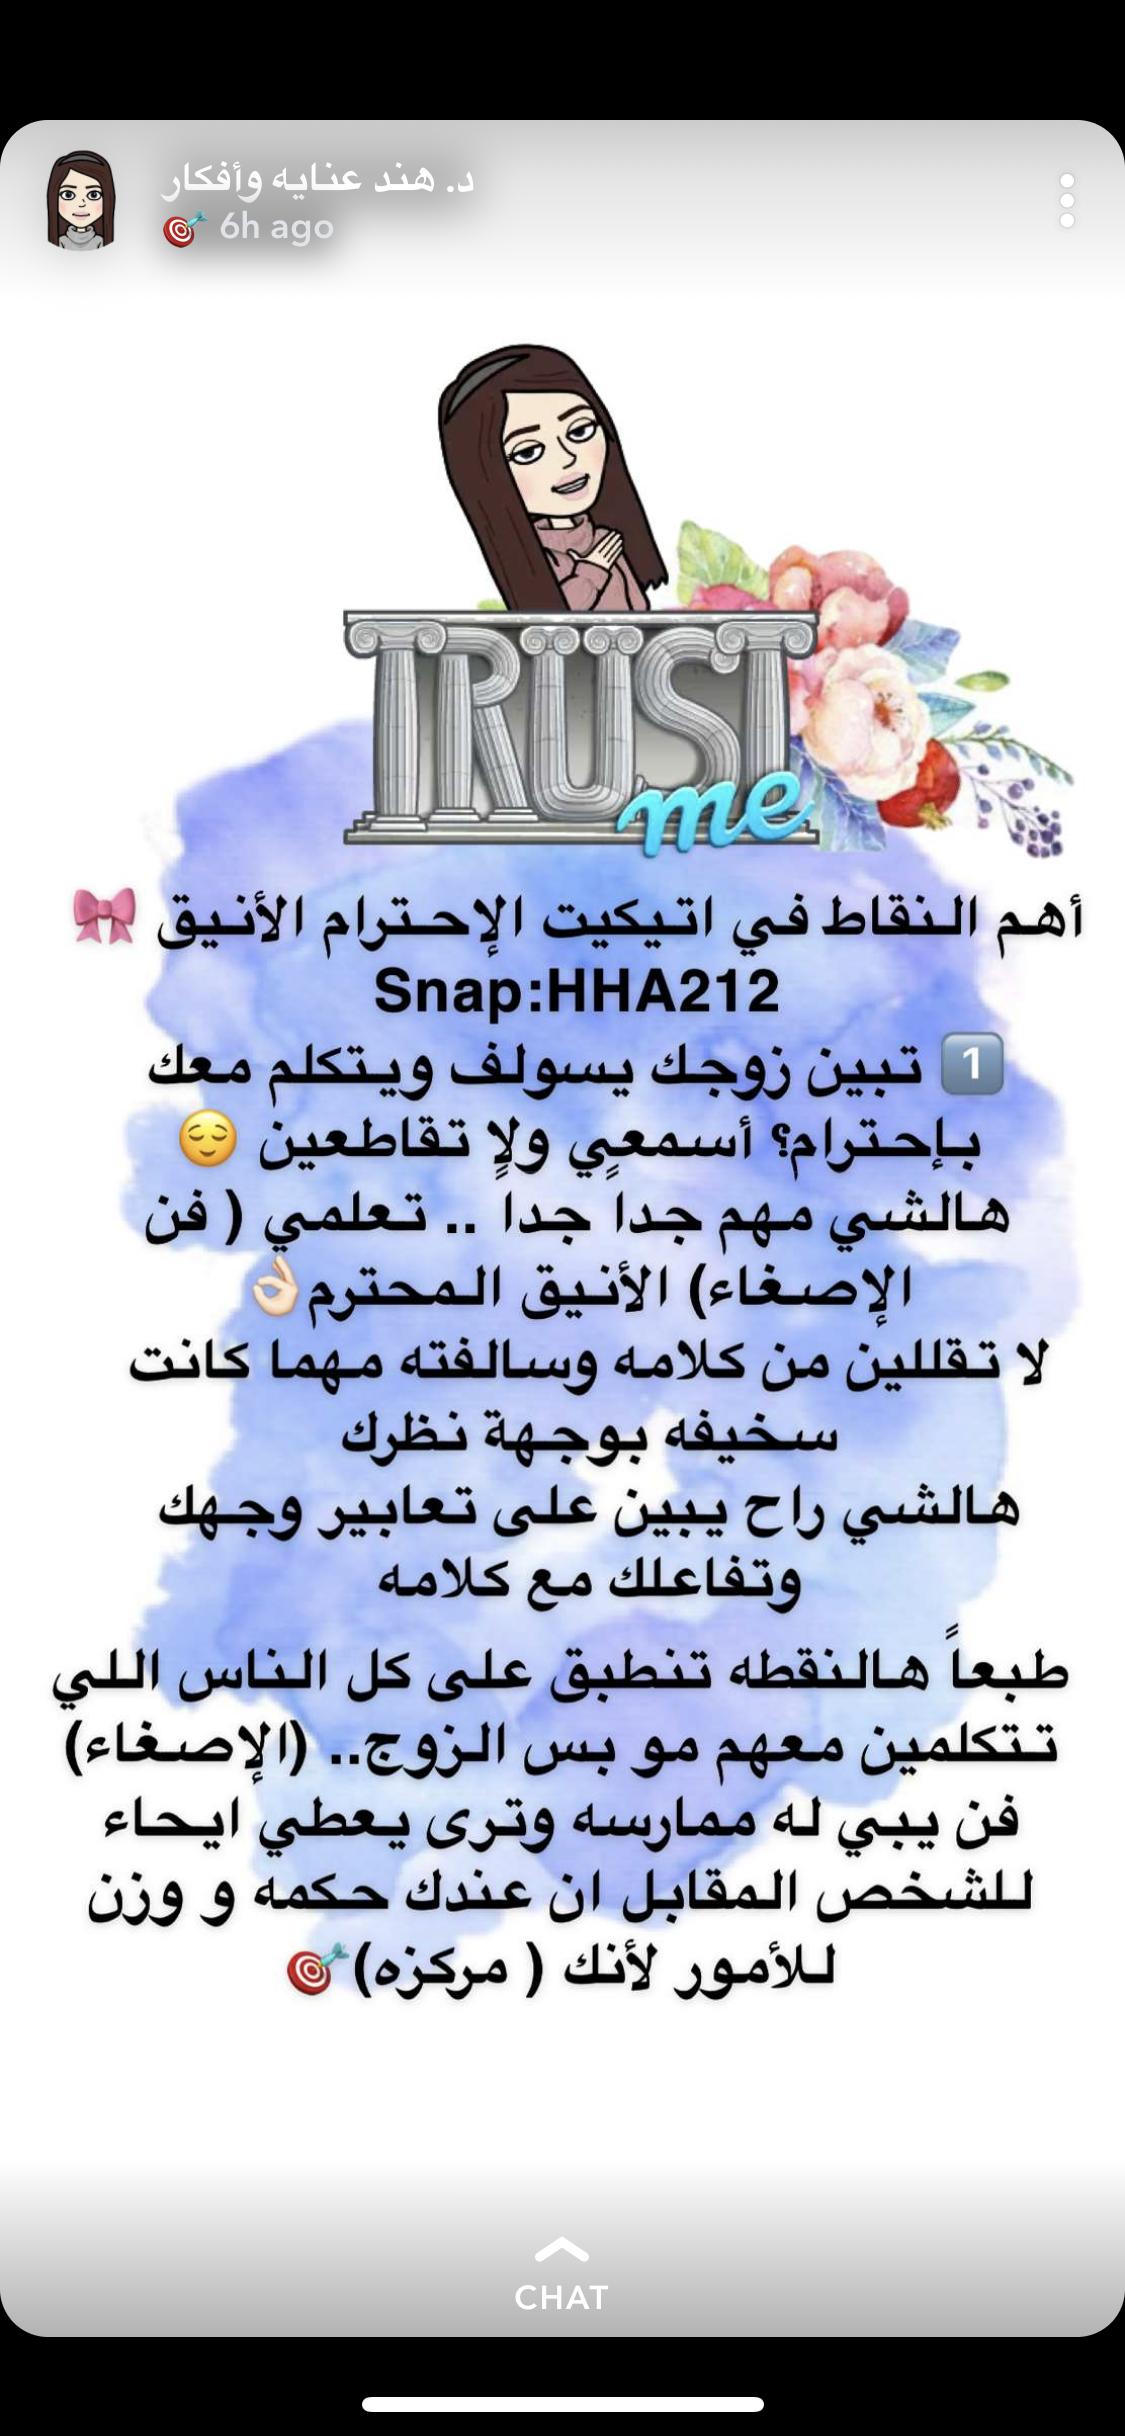 Pin By Lamis On الاحترام بين الرجل و المرأه Marriage Life Word Search Puzzle Words